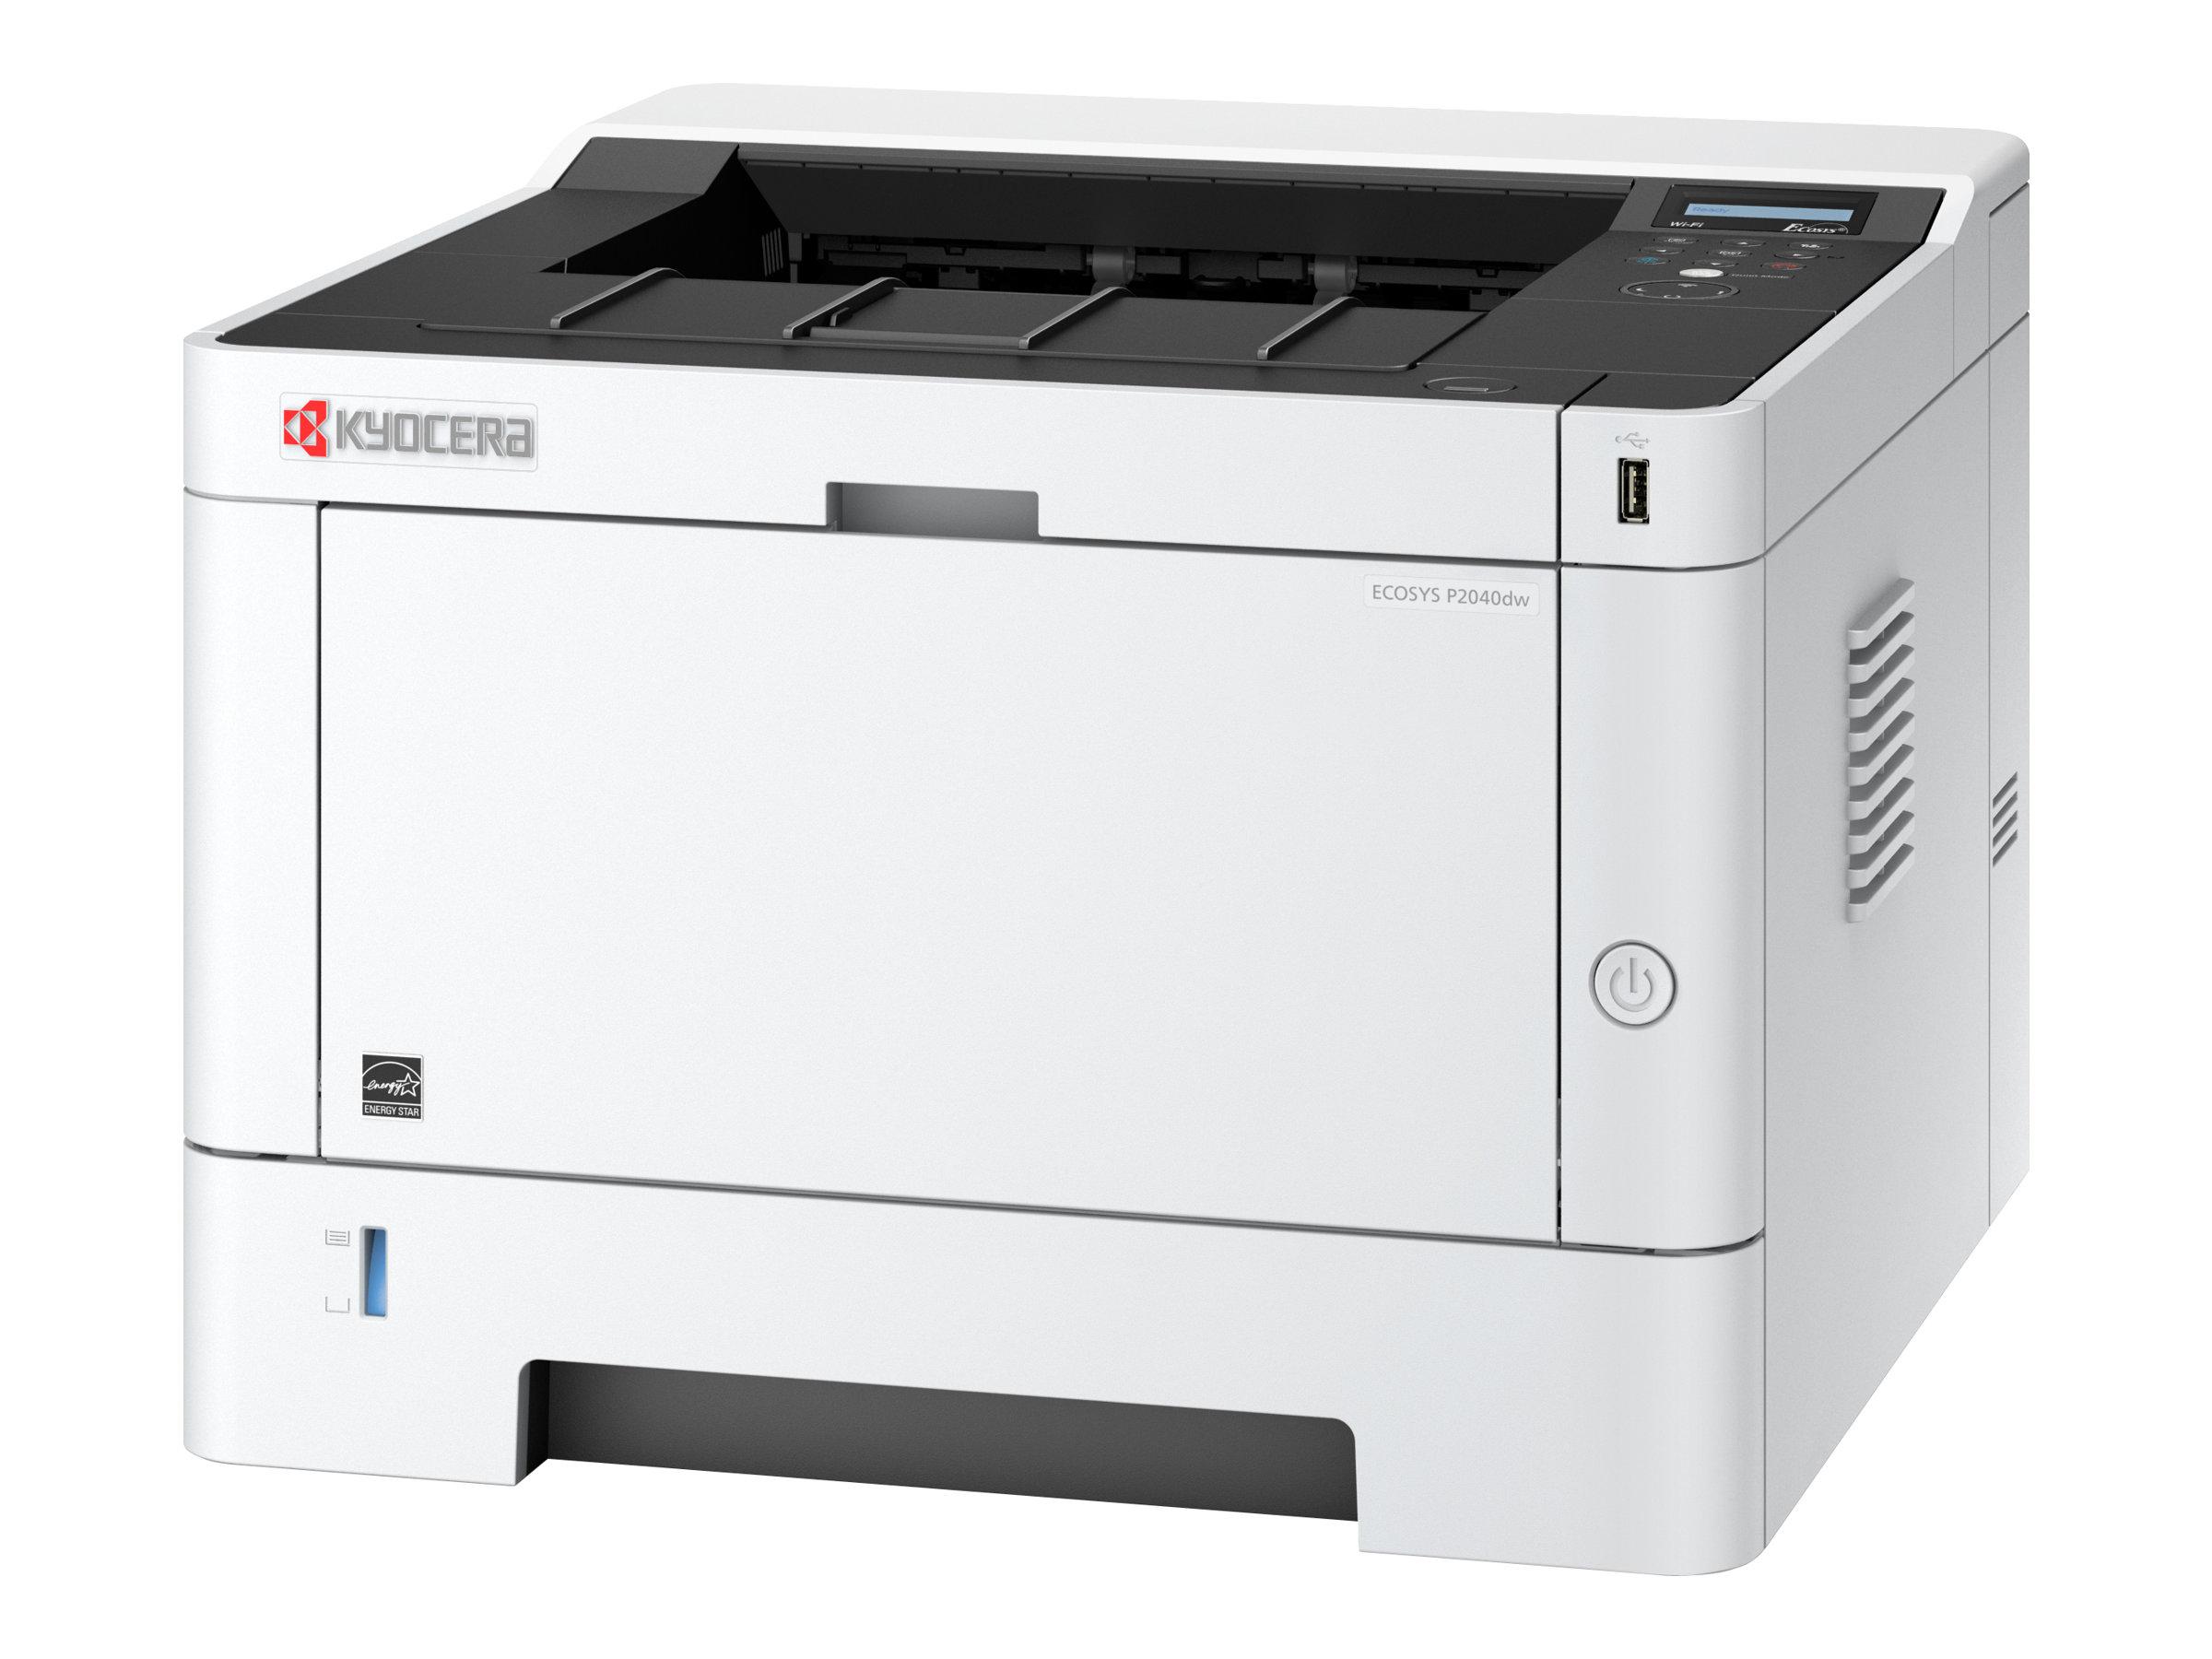 Kyocera ECOSYS P2040dw - Drucker - s/w - Duplex - Laser - A4/Legal